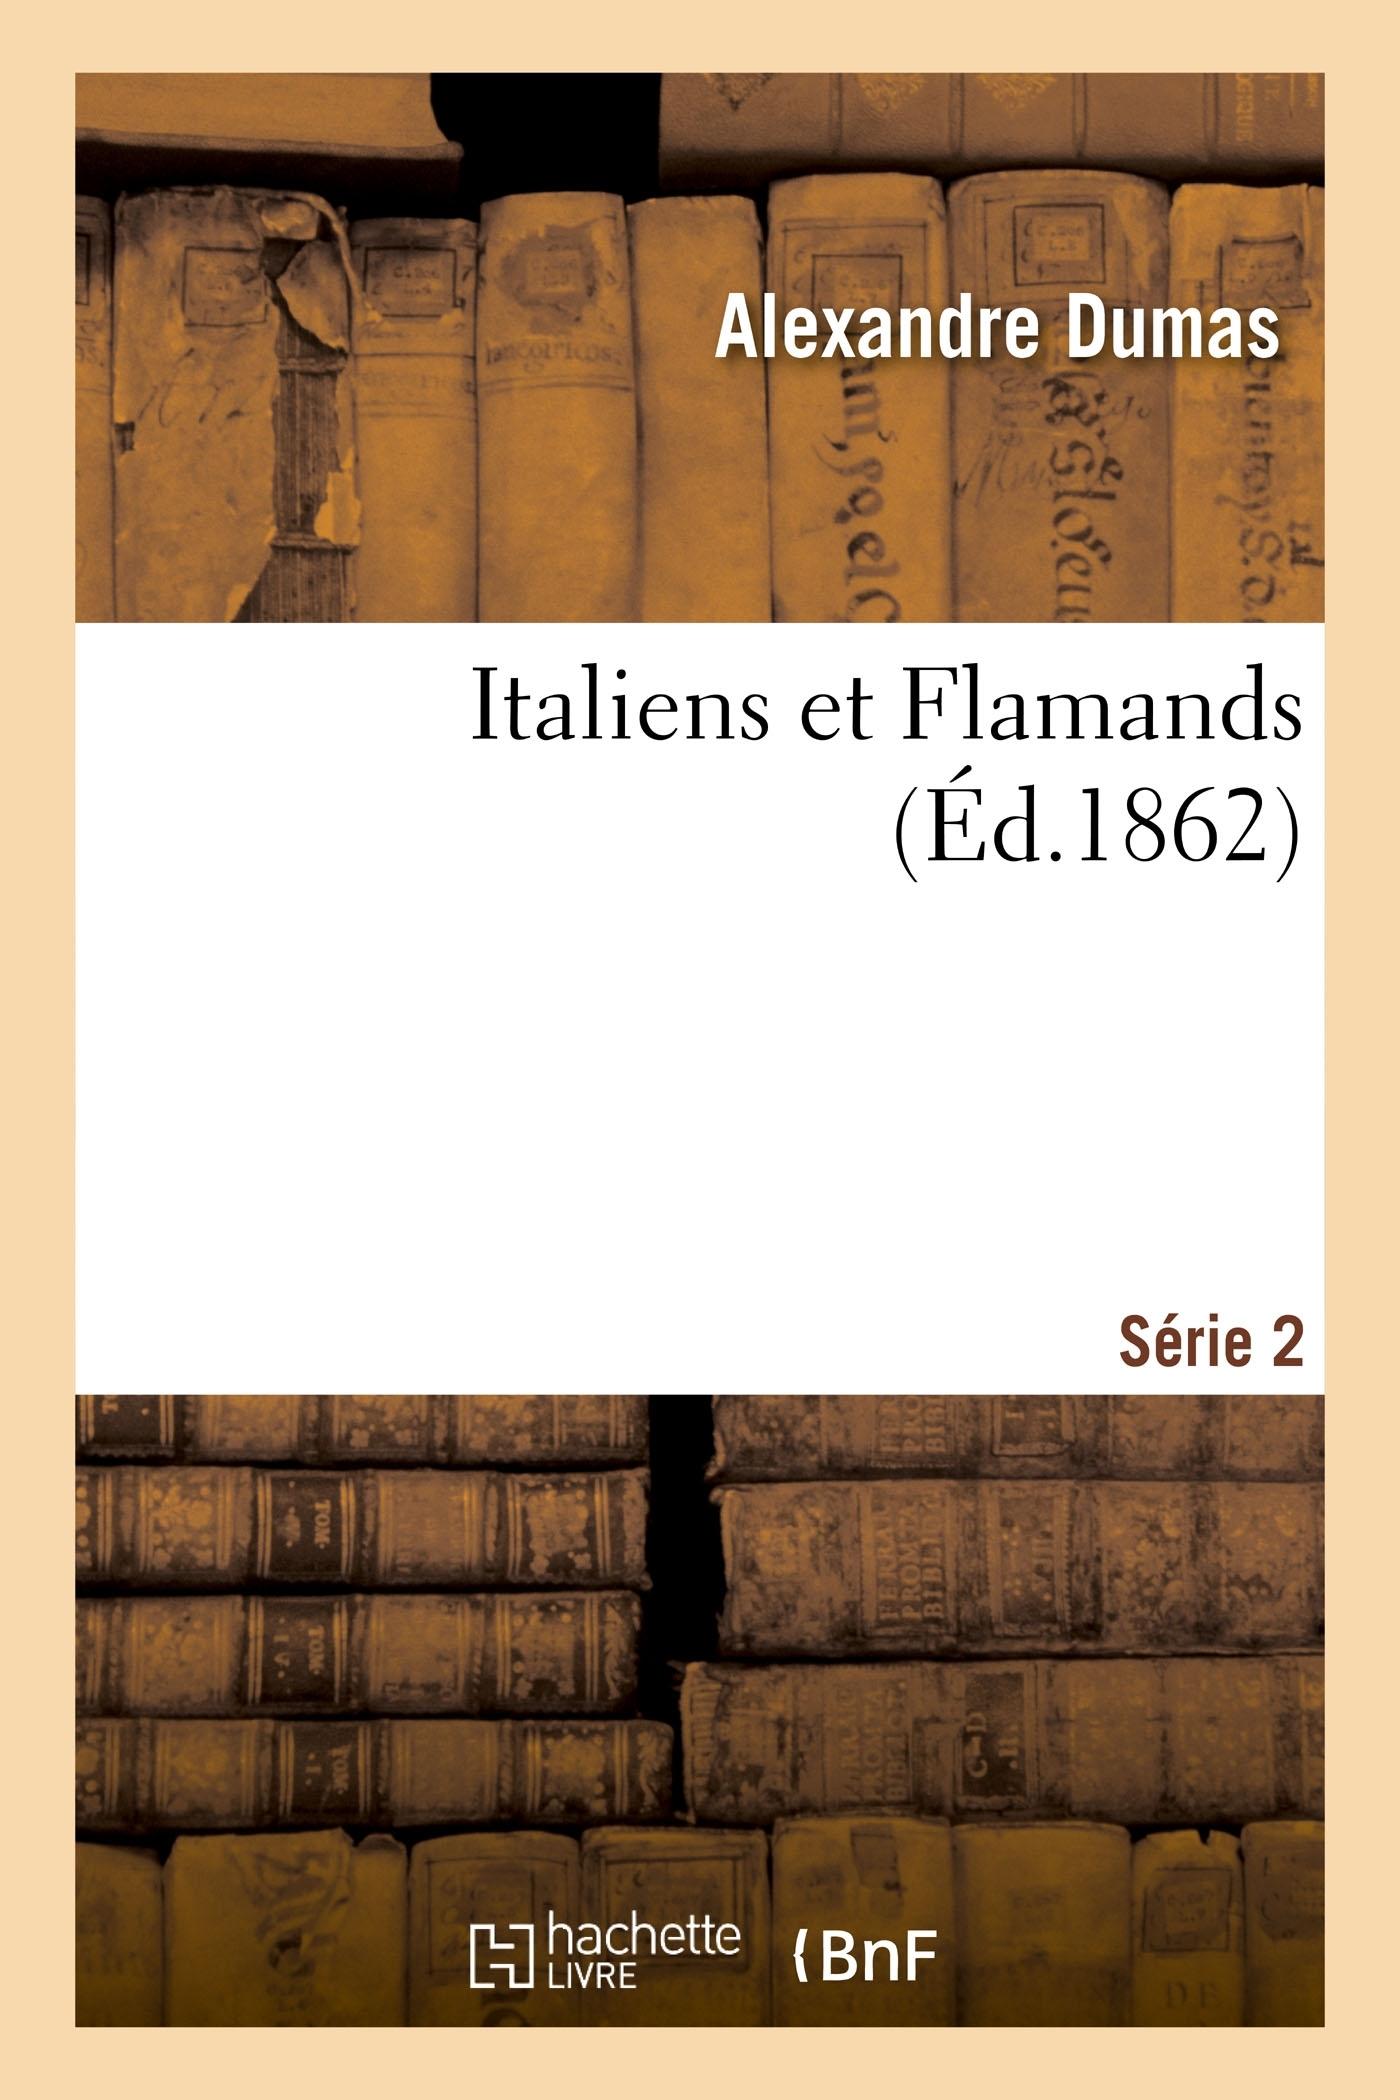 ITALIENS ET FLAMANDS. SERIE 2